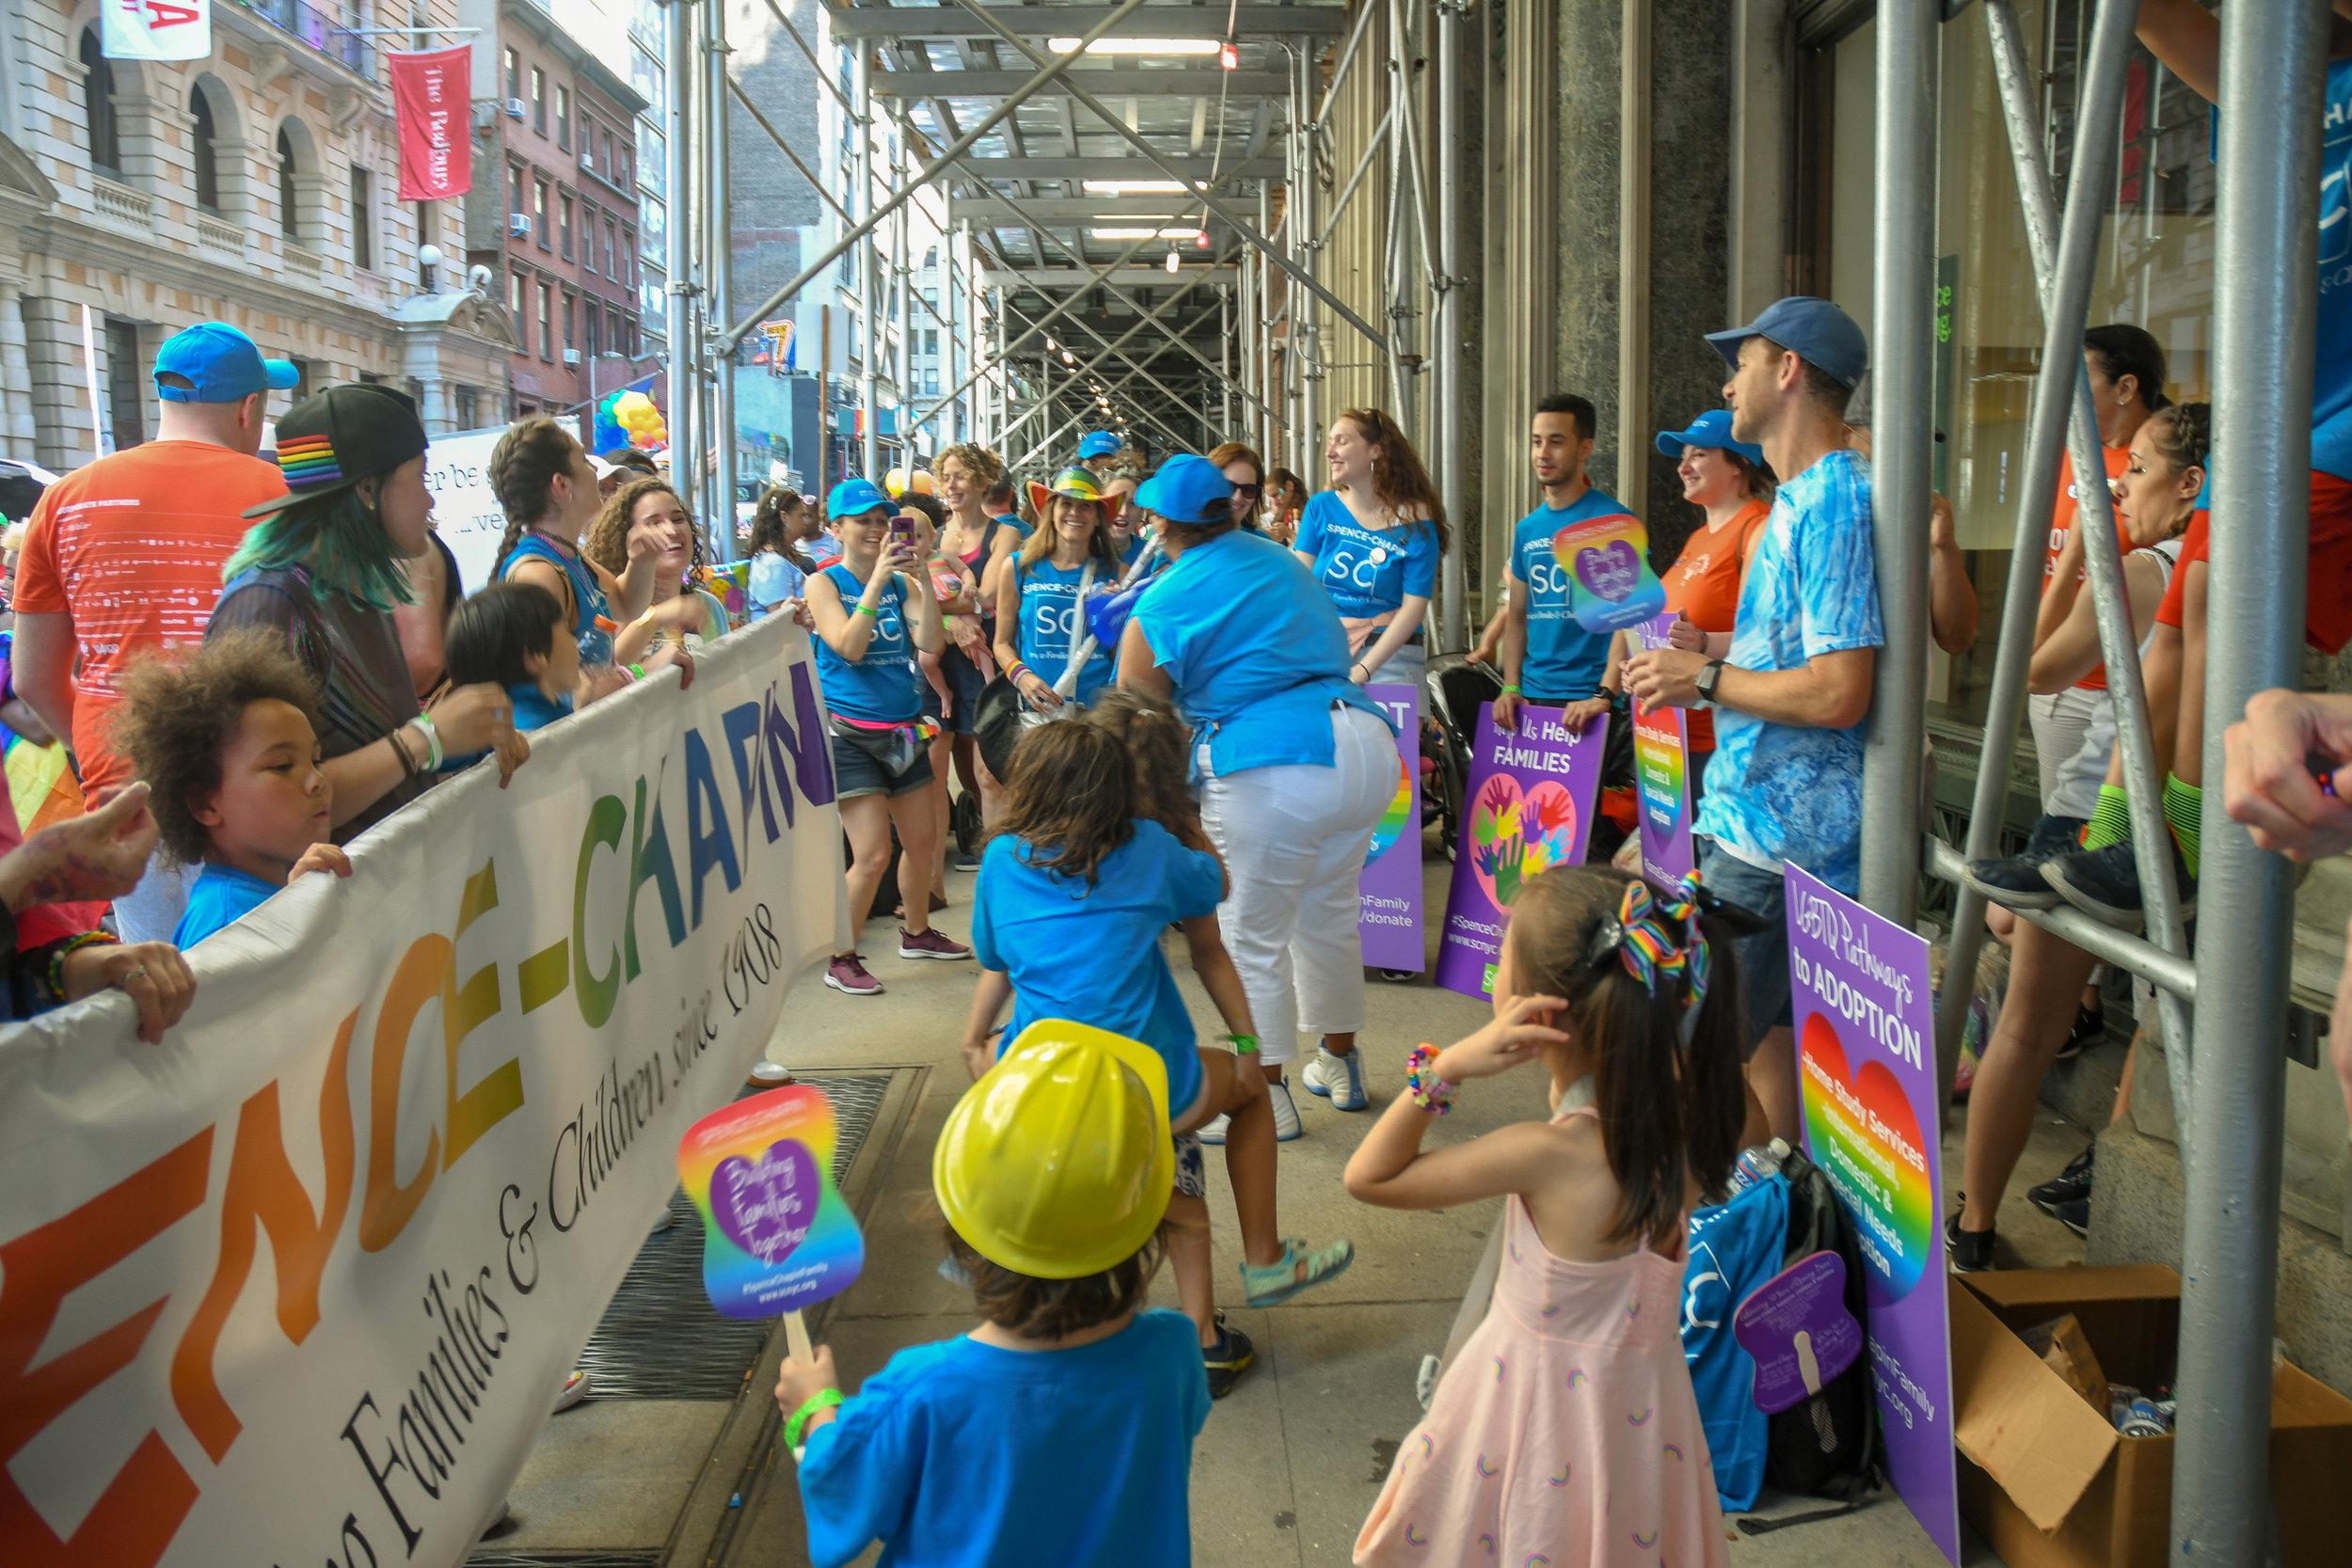 SC-PrideParade-2019_FE-81.jpg